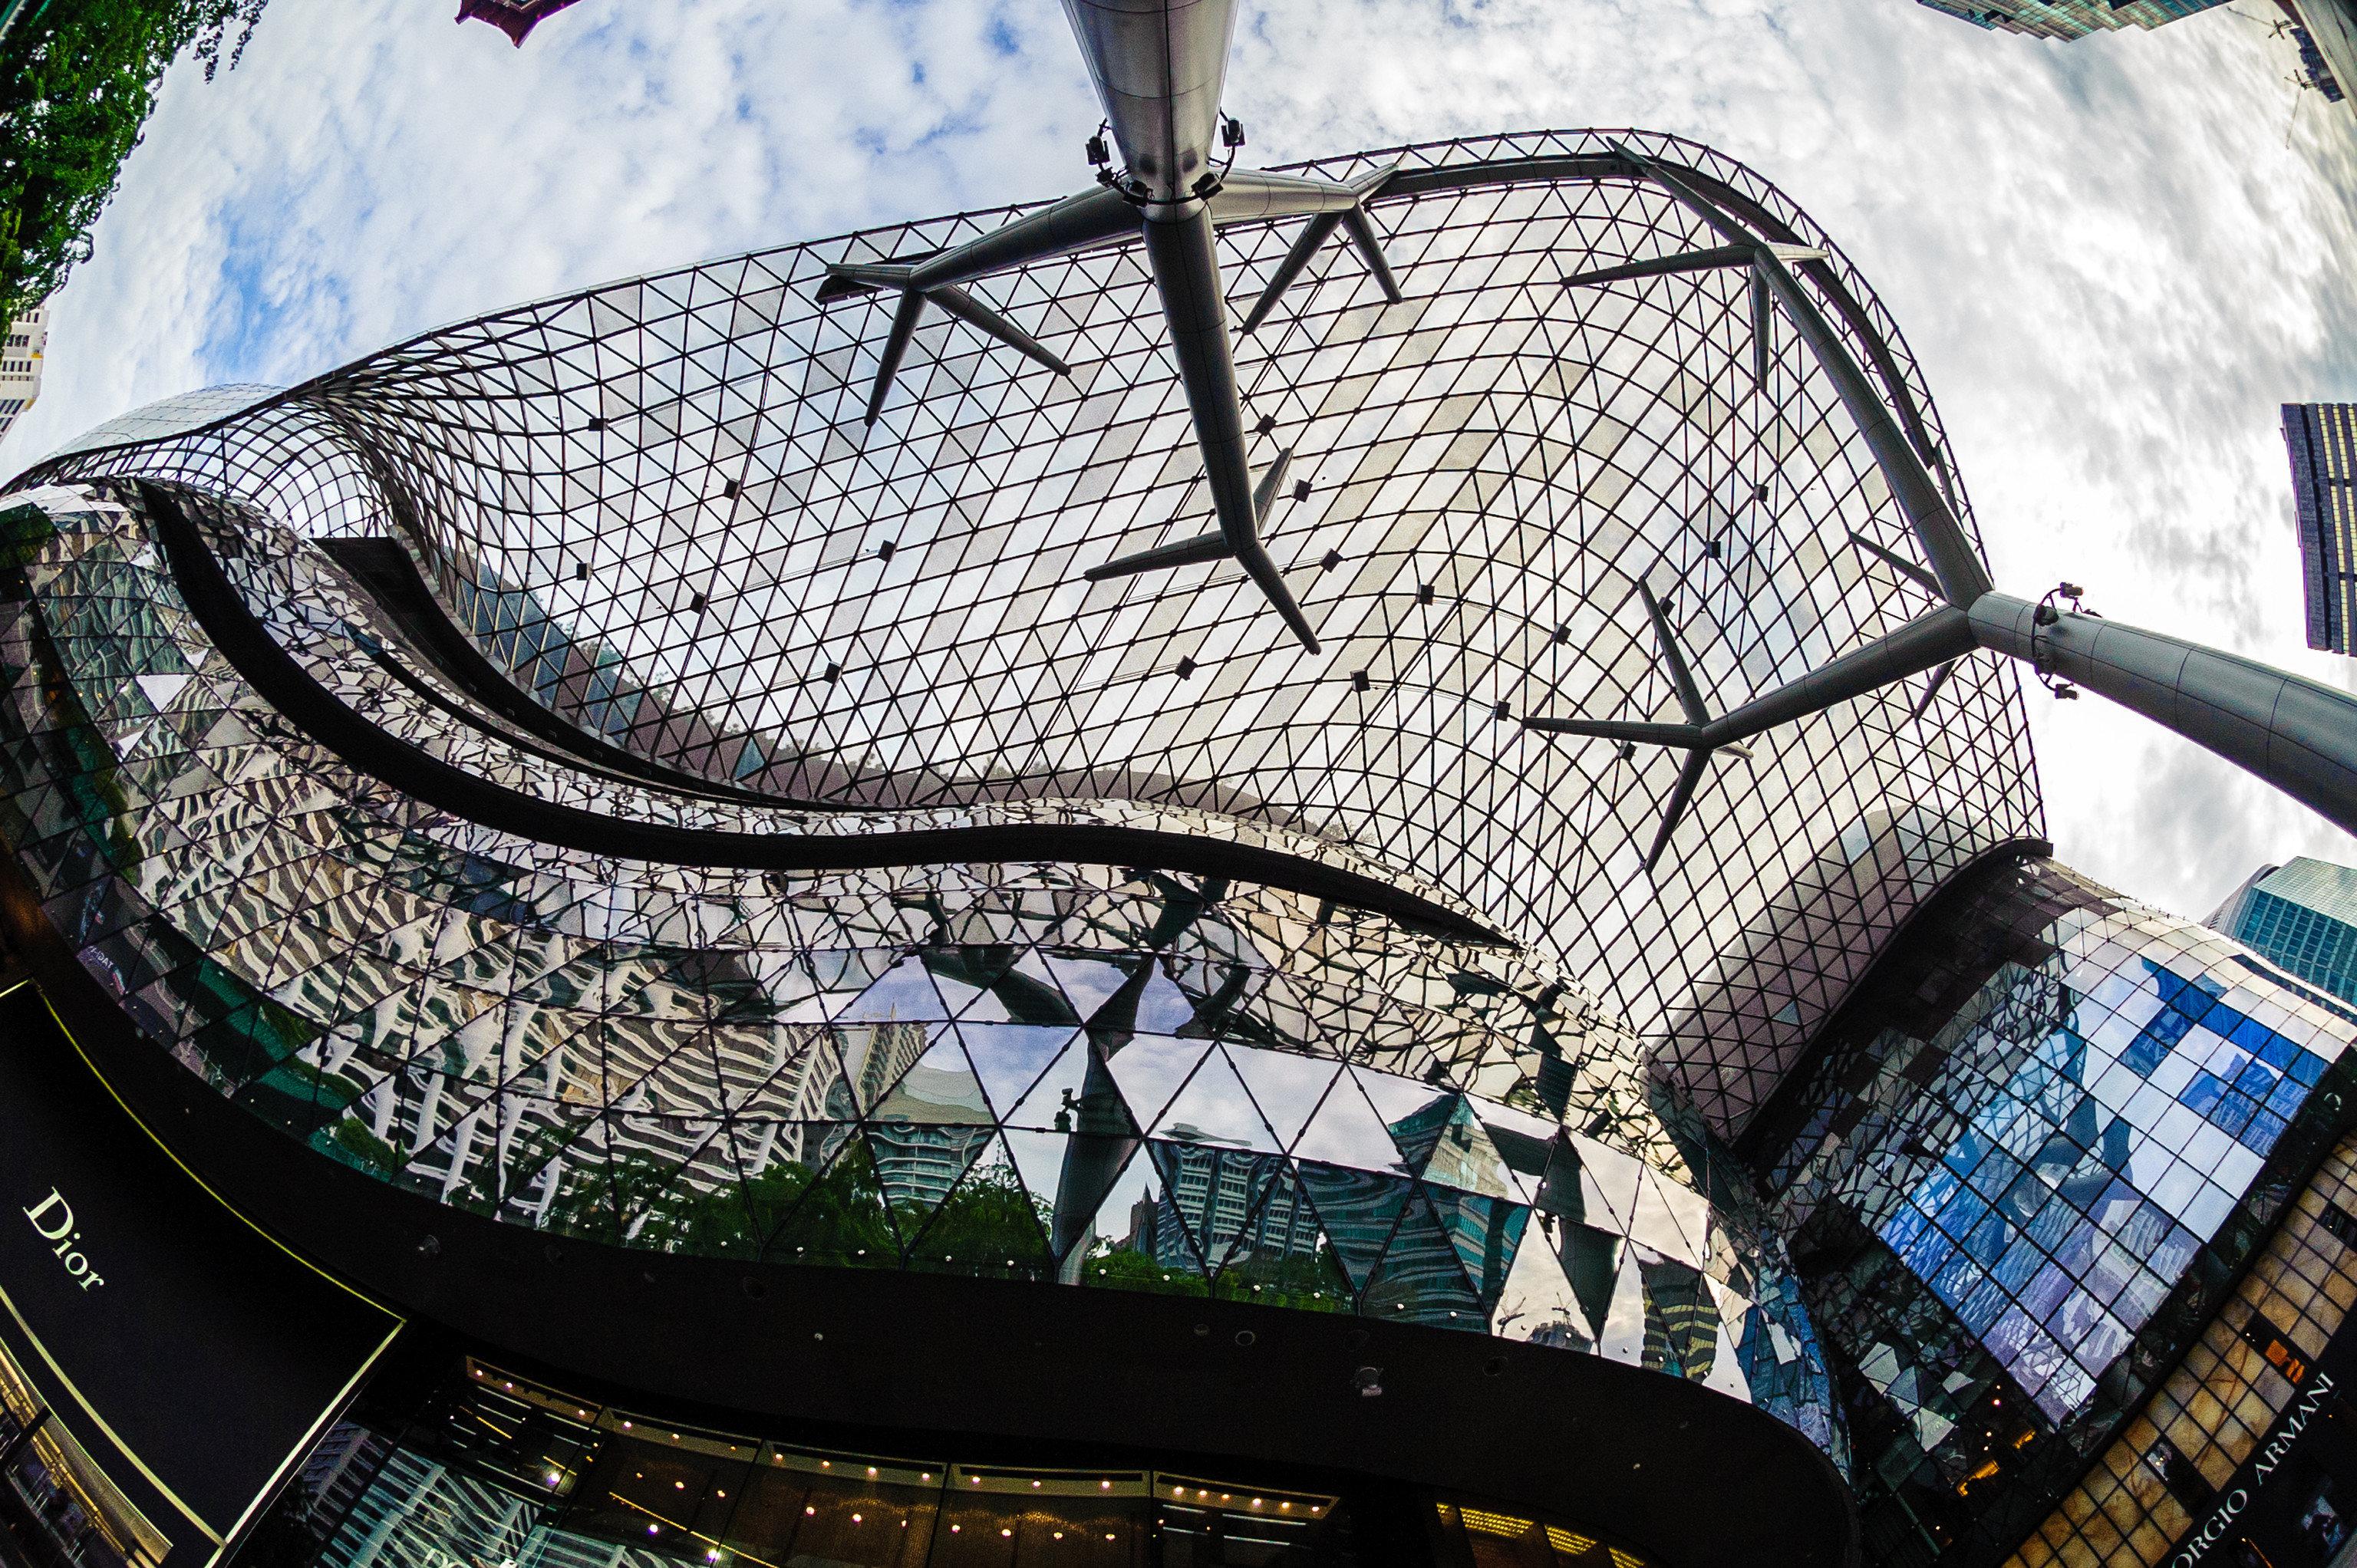 Offbeat Singapore Trip Ideas amusement park art sport venue metal amusement ride stadium world park